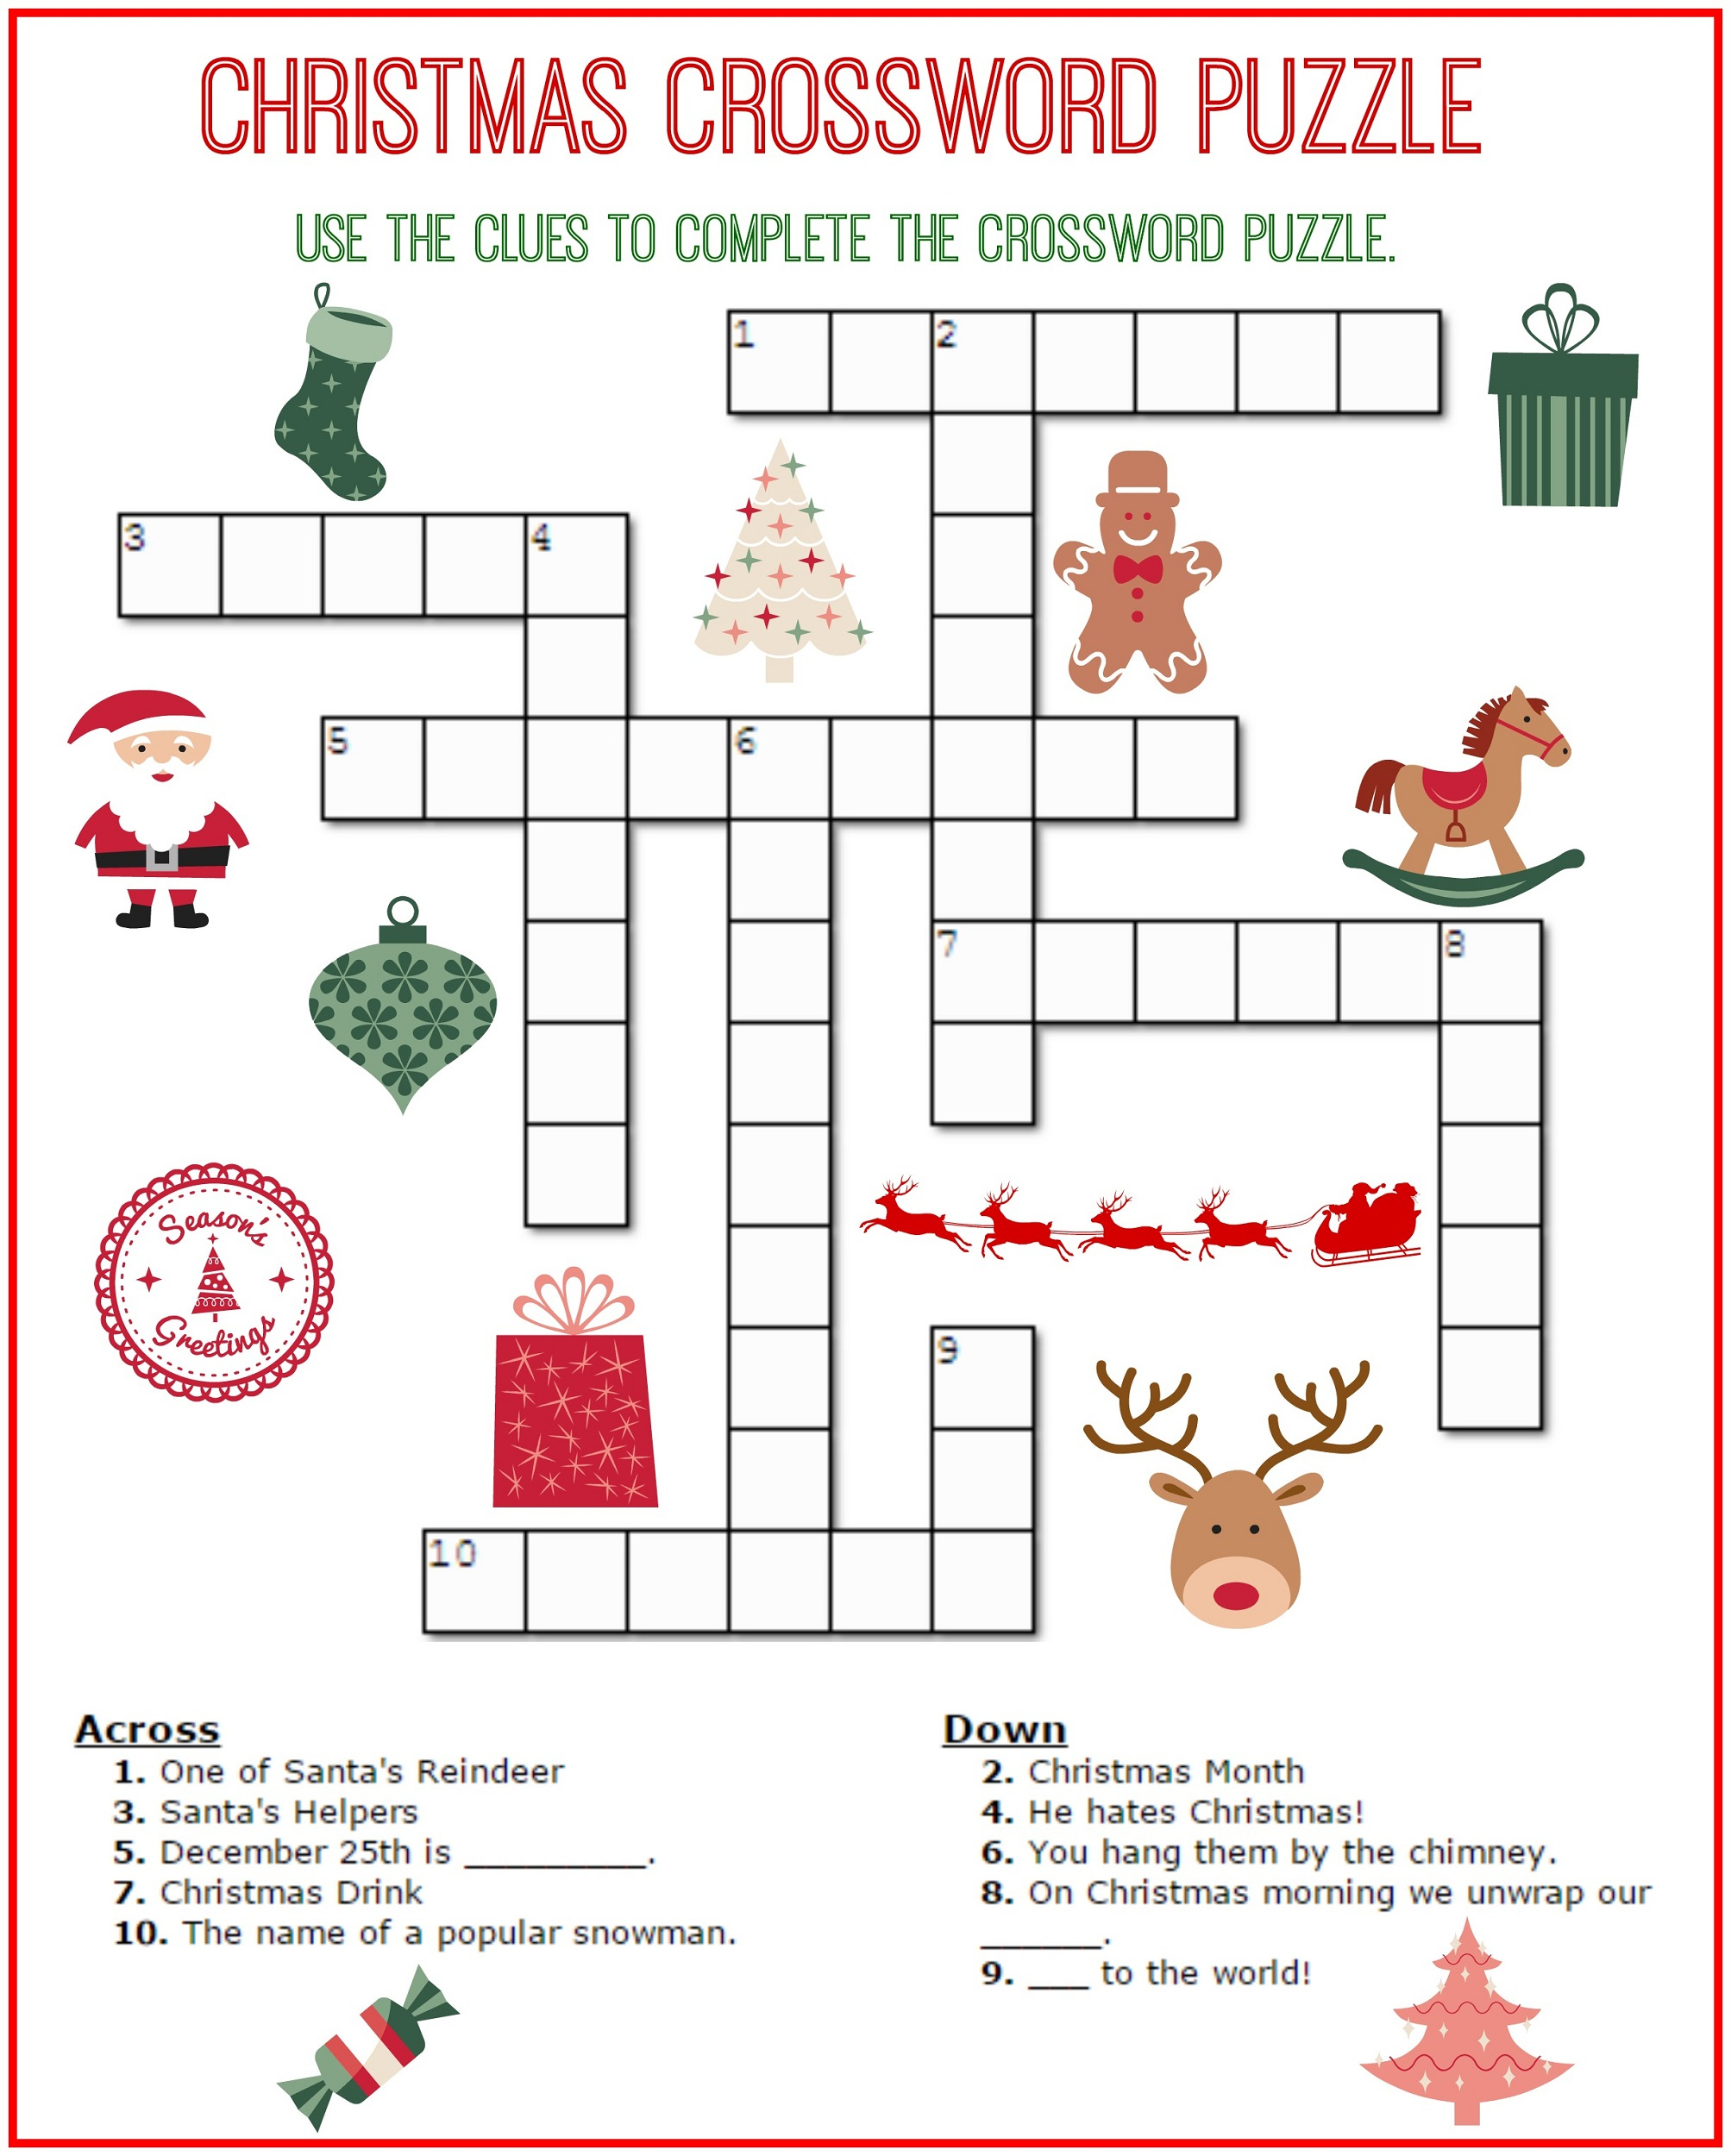 Crossword Puzzle Kids Printable 2017 | Kiddo Shelter - Free Easy - Printable Crossword Puzzles For Students